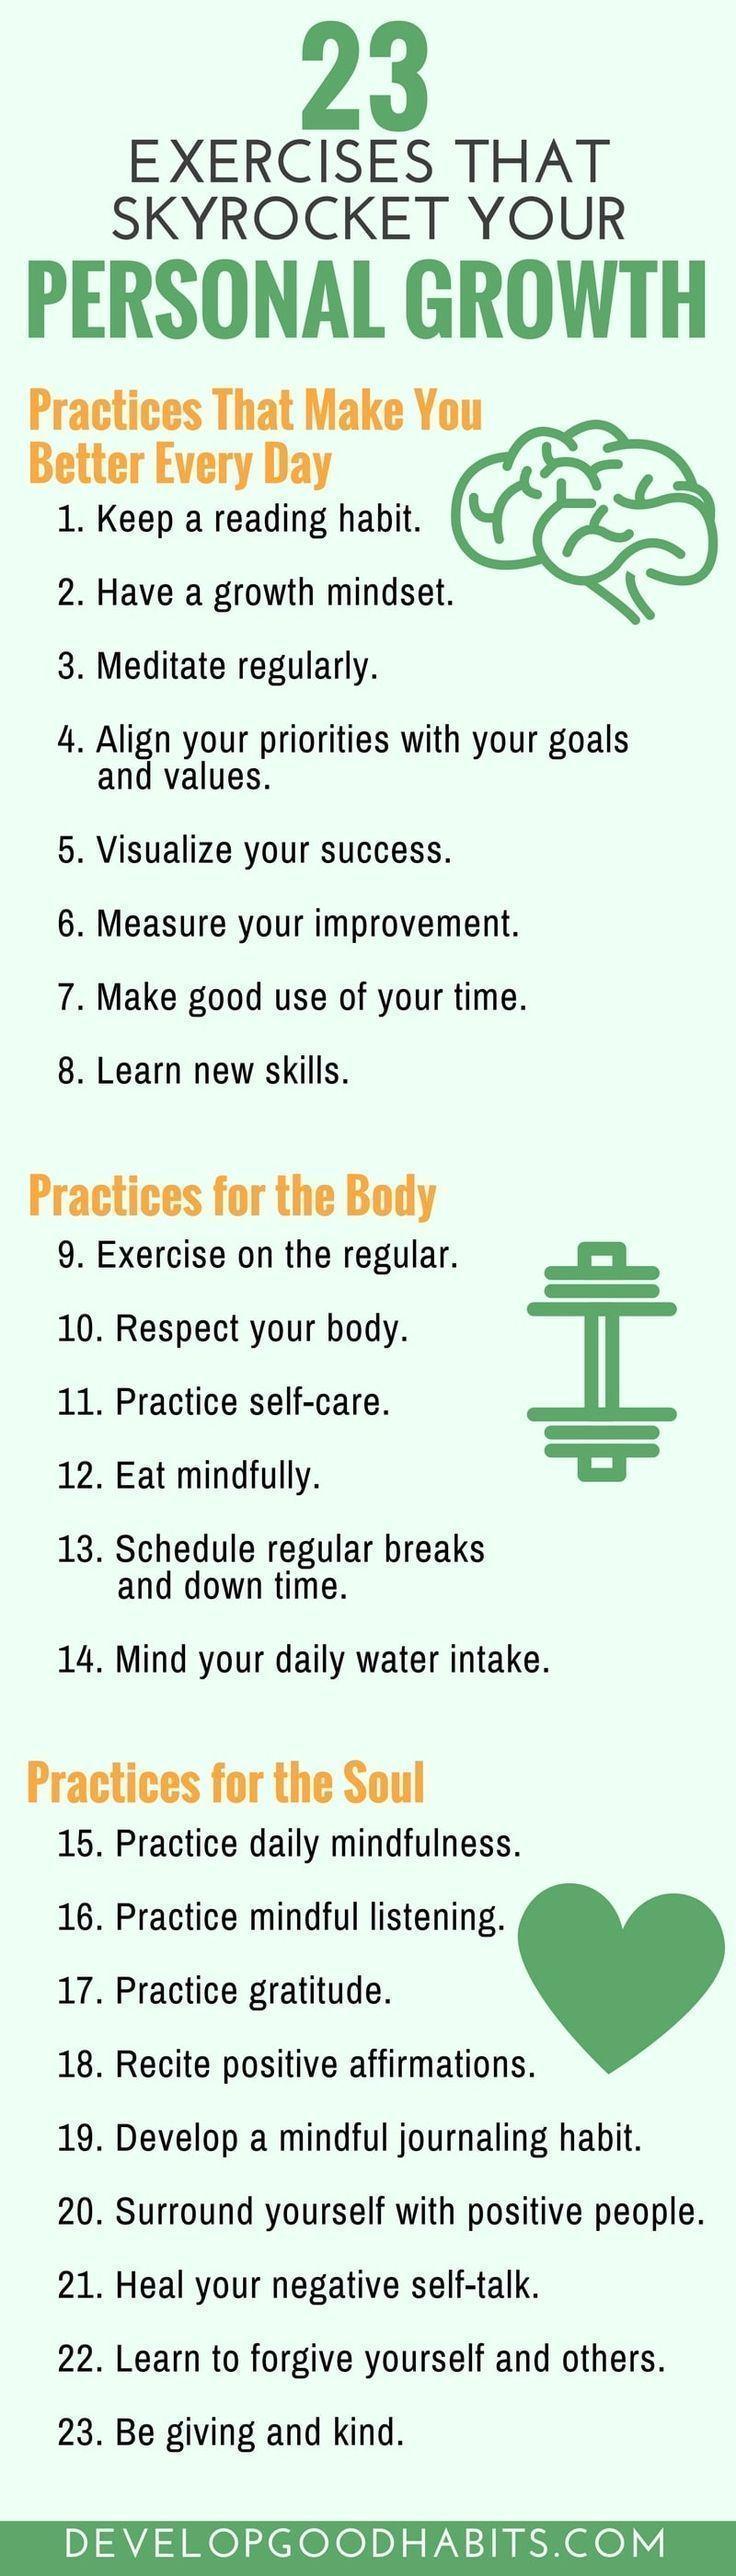 23 Self Improvement Exercises to Transform Your Life